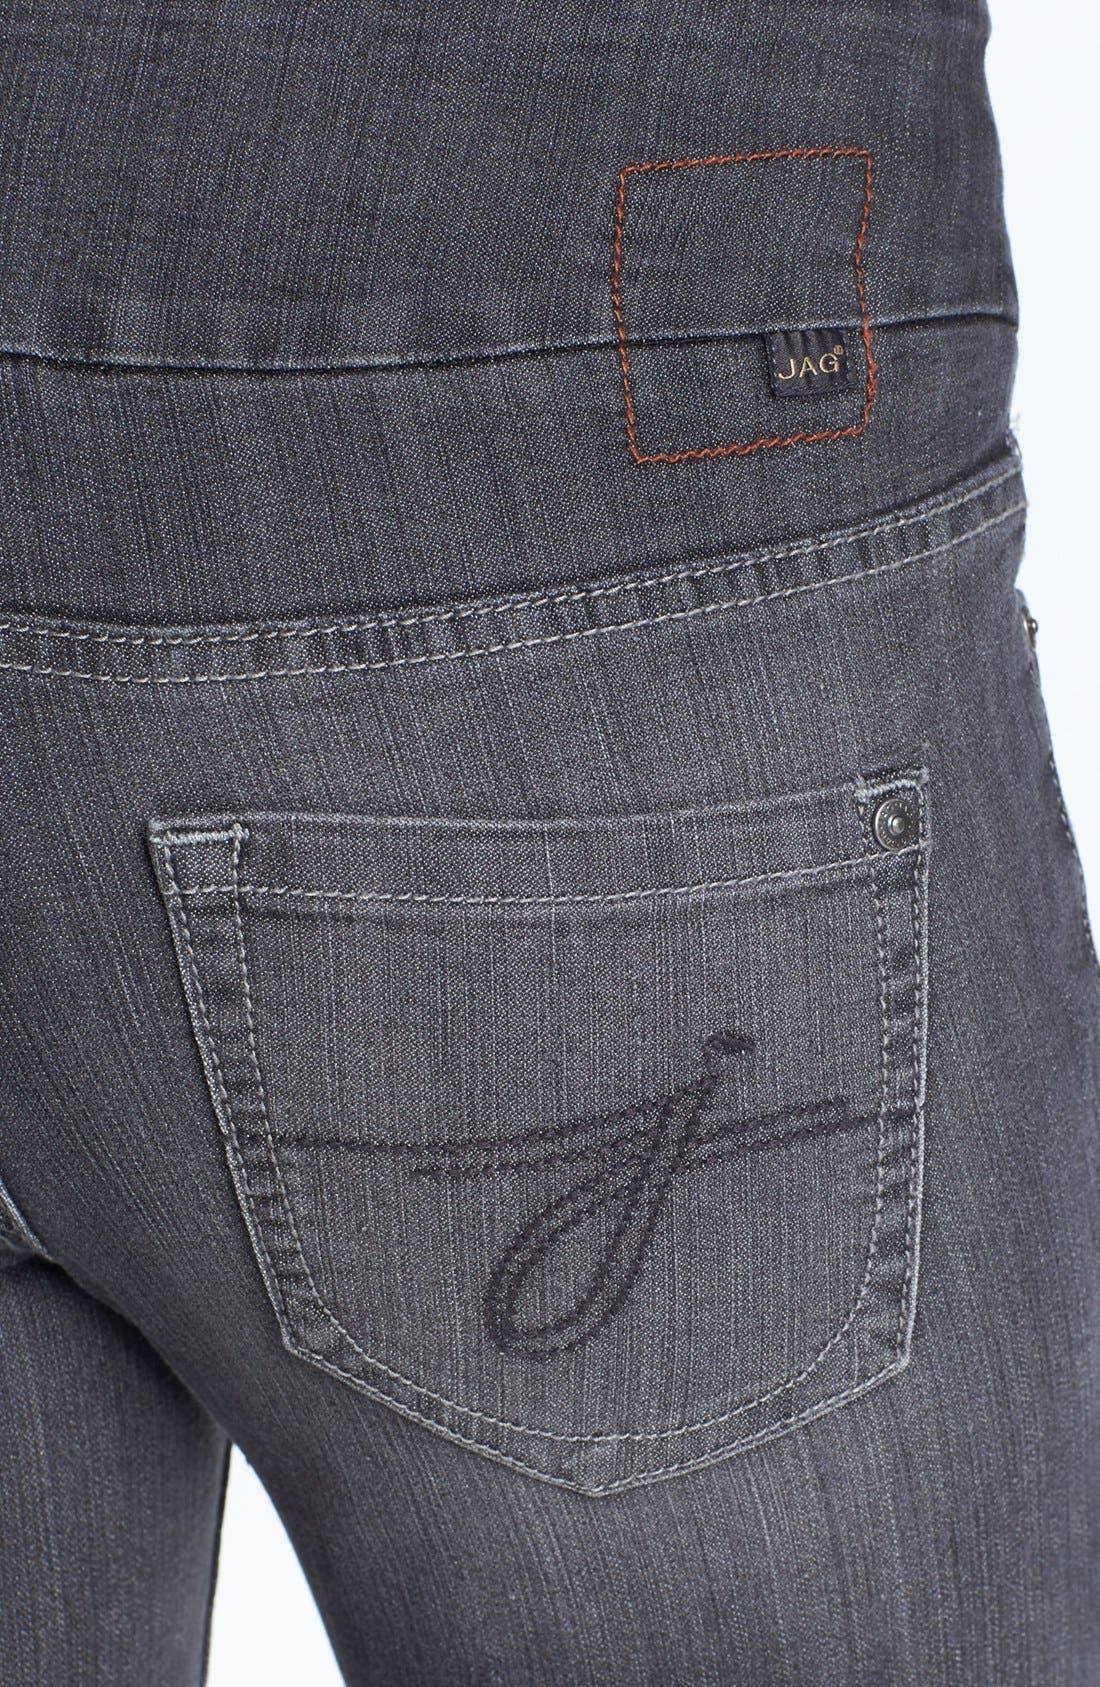 Alternate Image 3  - Jag Jeans 'Malia' Slim Leg Stretch Jeans (Grey) (Petite)